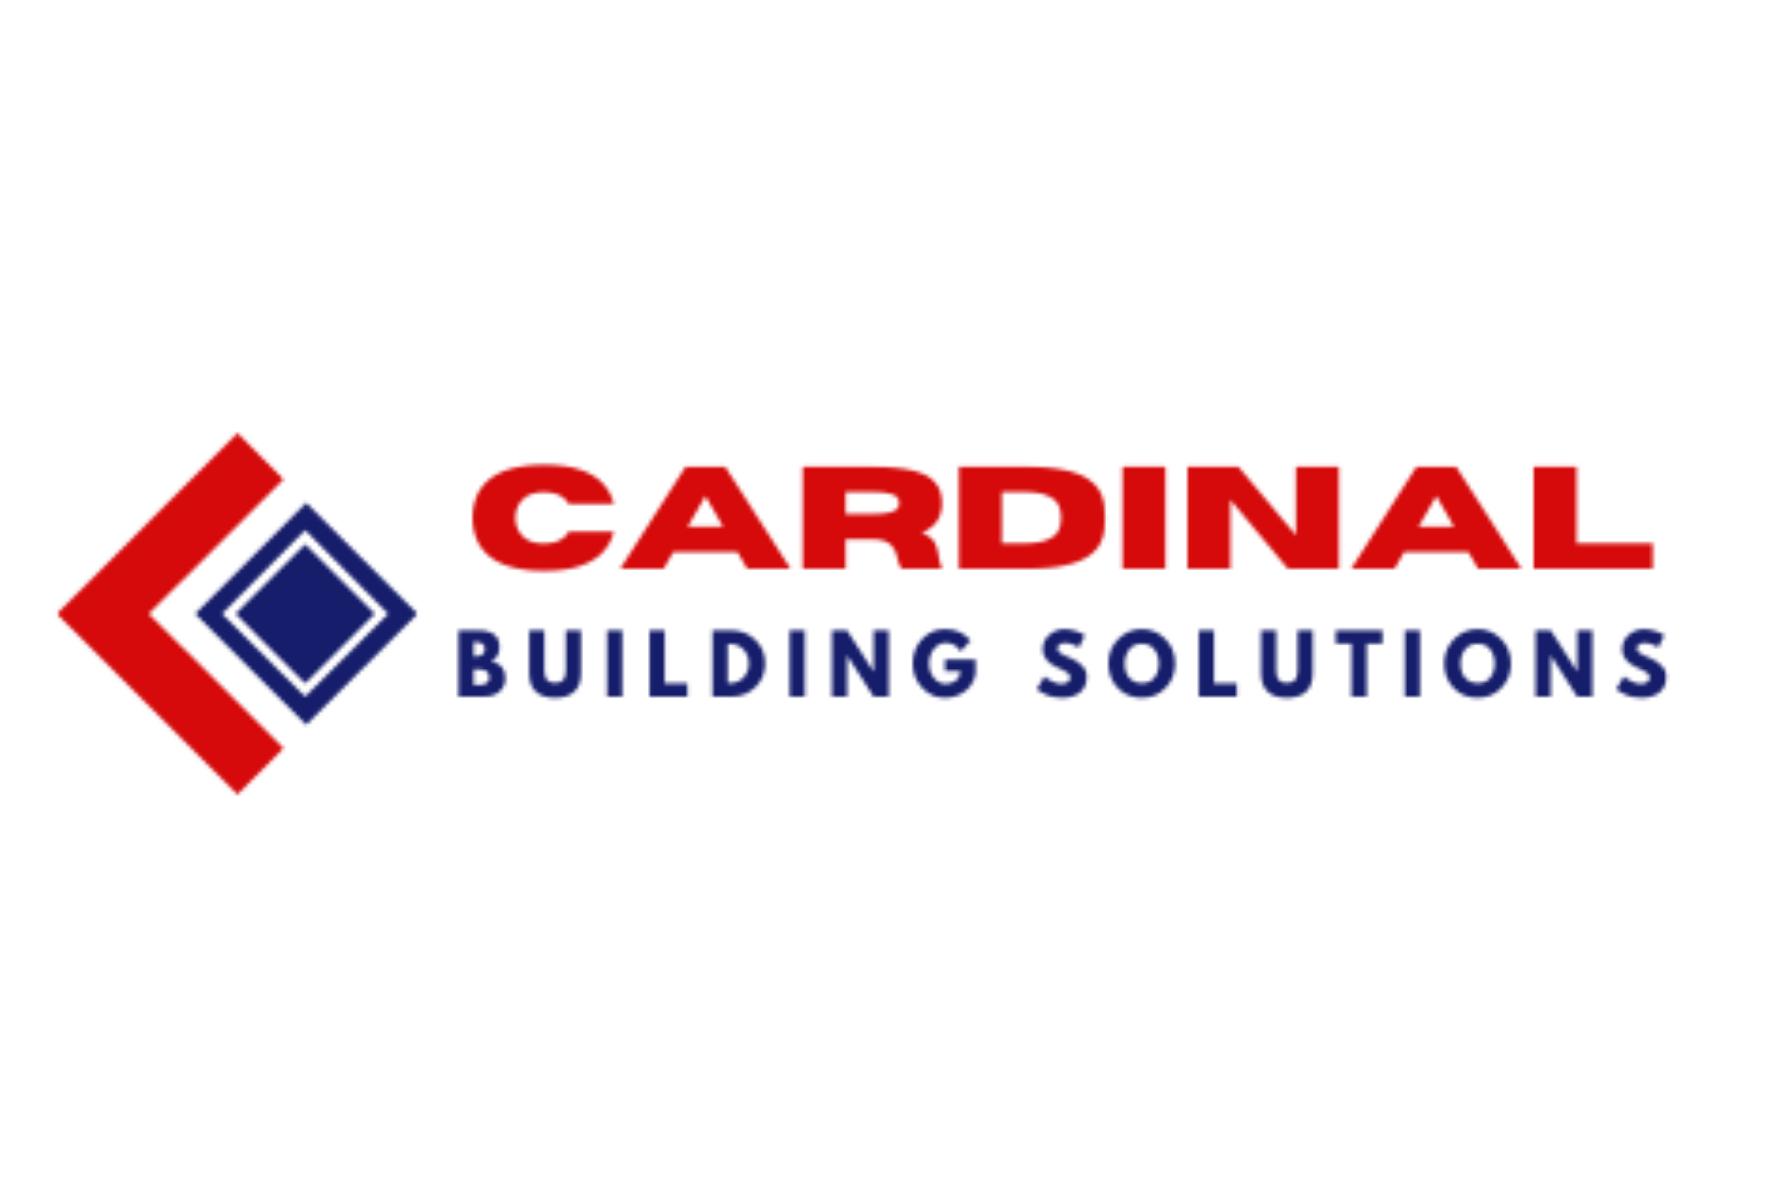 Cardinal Building Solutions